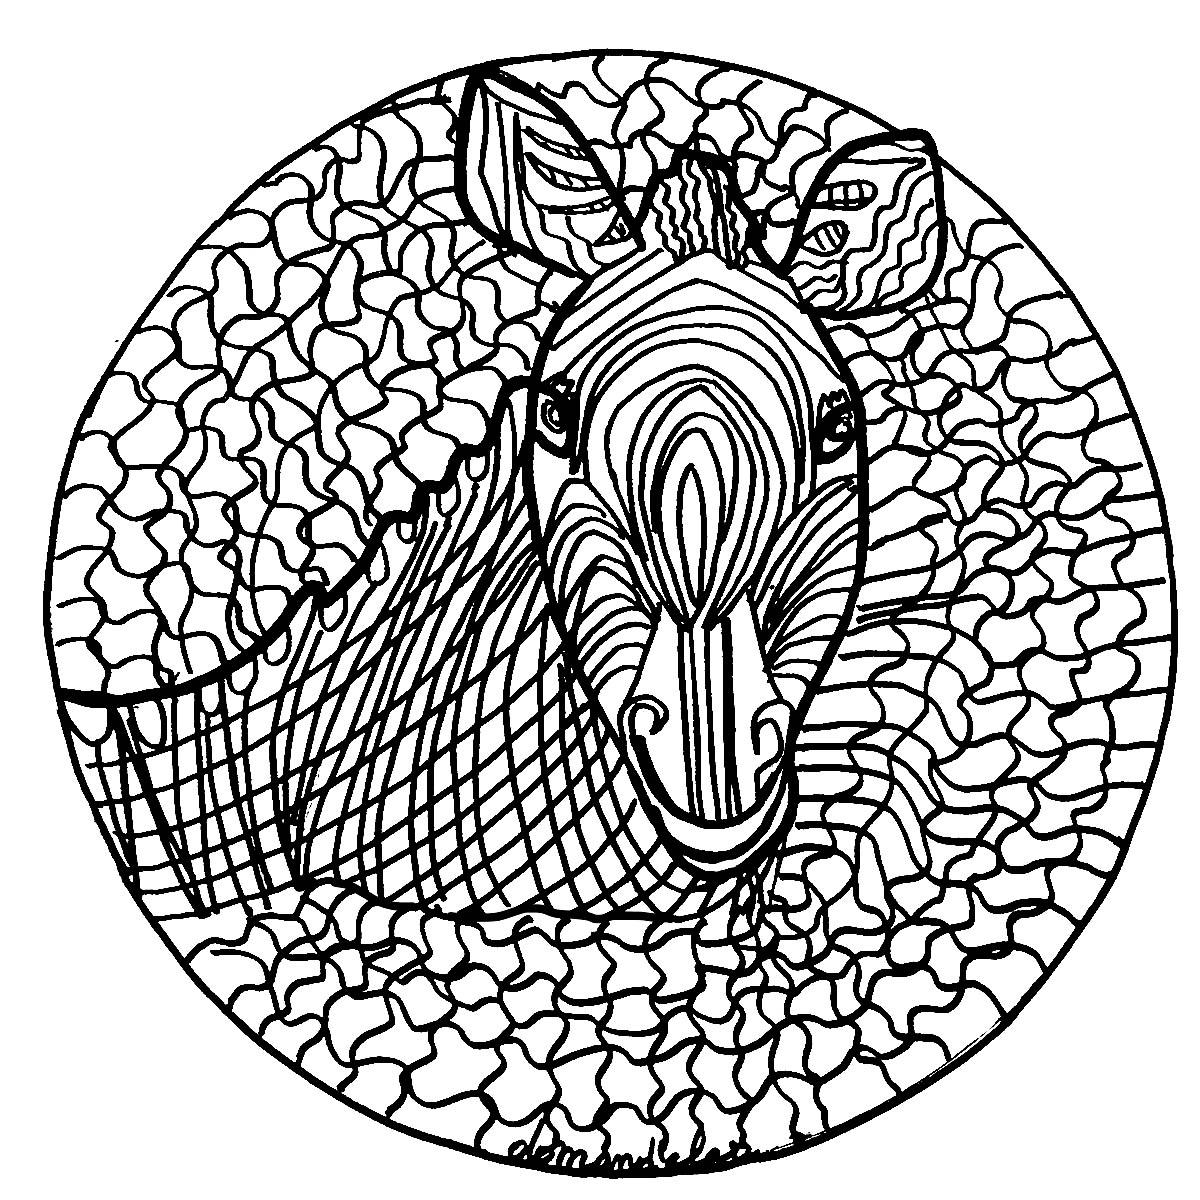 Malbuch Fur Erwachsene  : Mandalas - 237